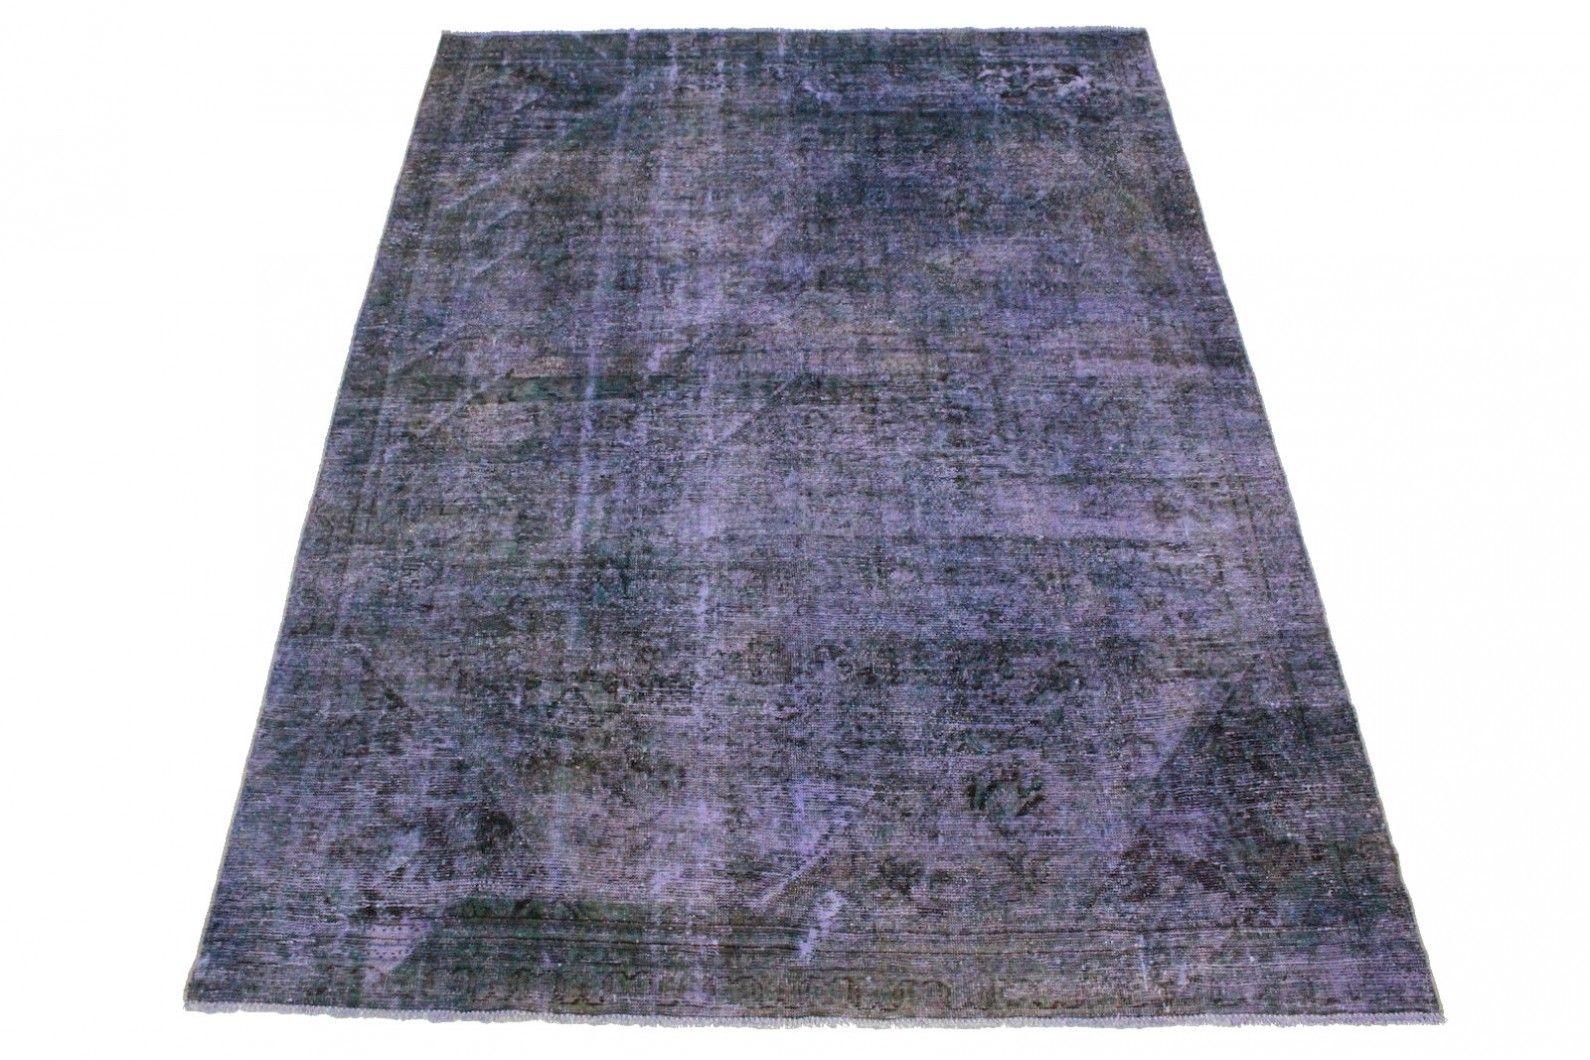 Teppich lila  Vintage Teppich Lila in 320x220cm | Colorierte Vintage Teppiche ...